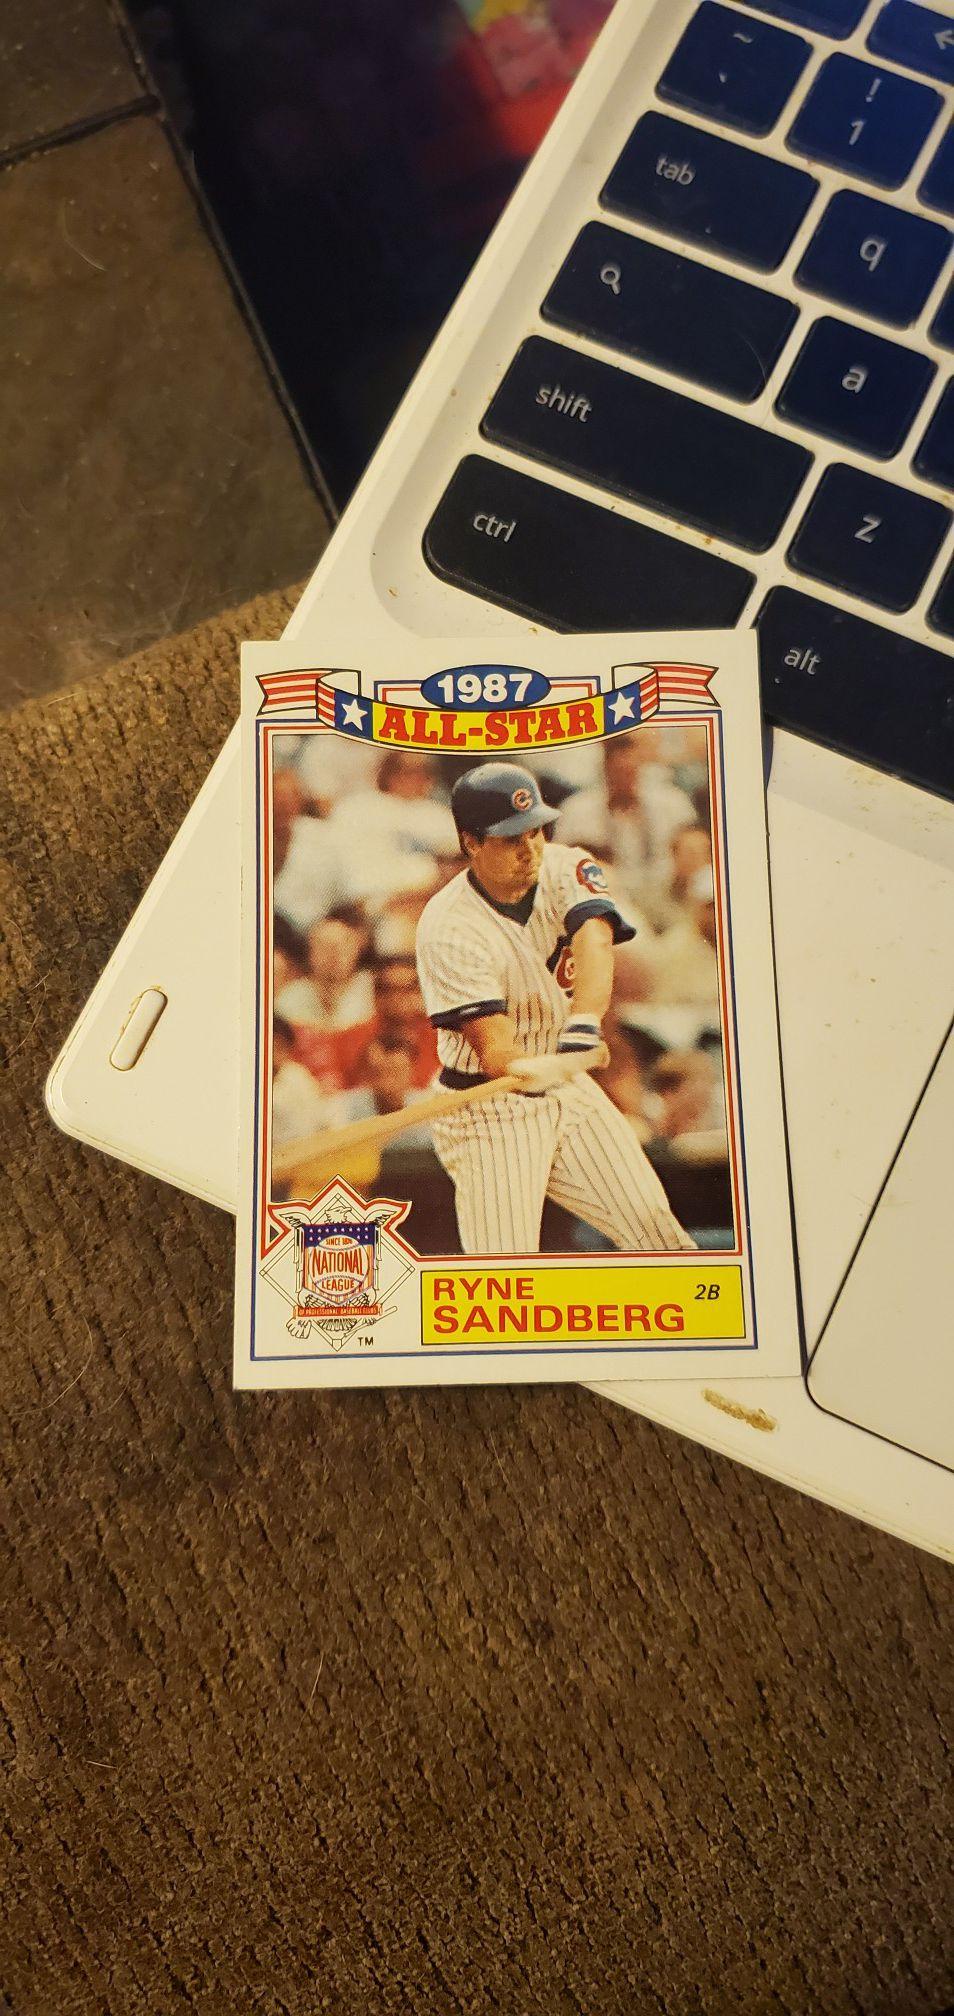 Ryne sandberg baseball card